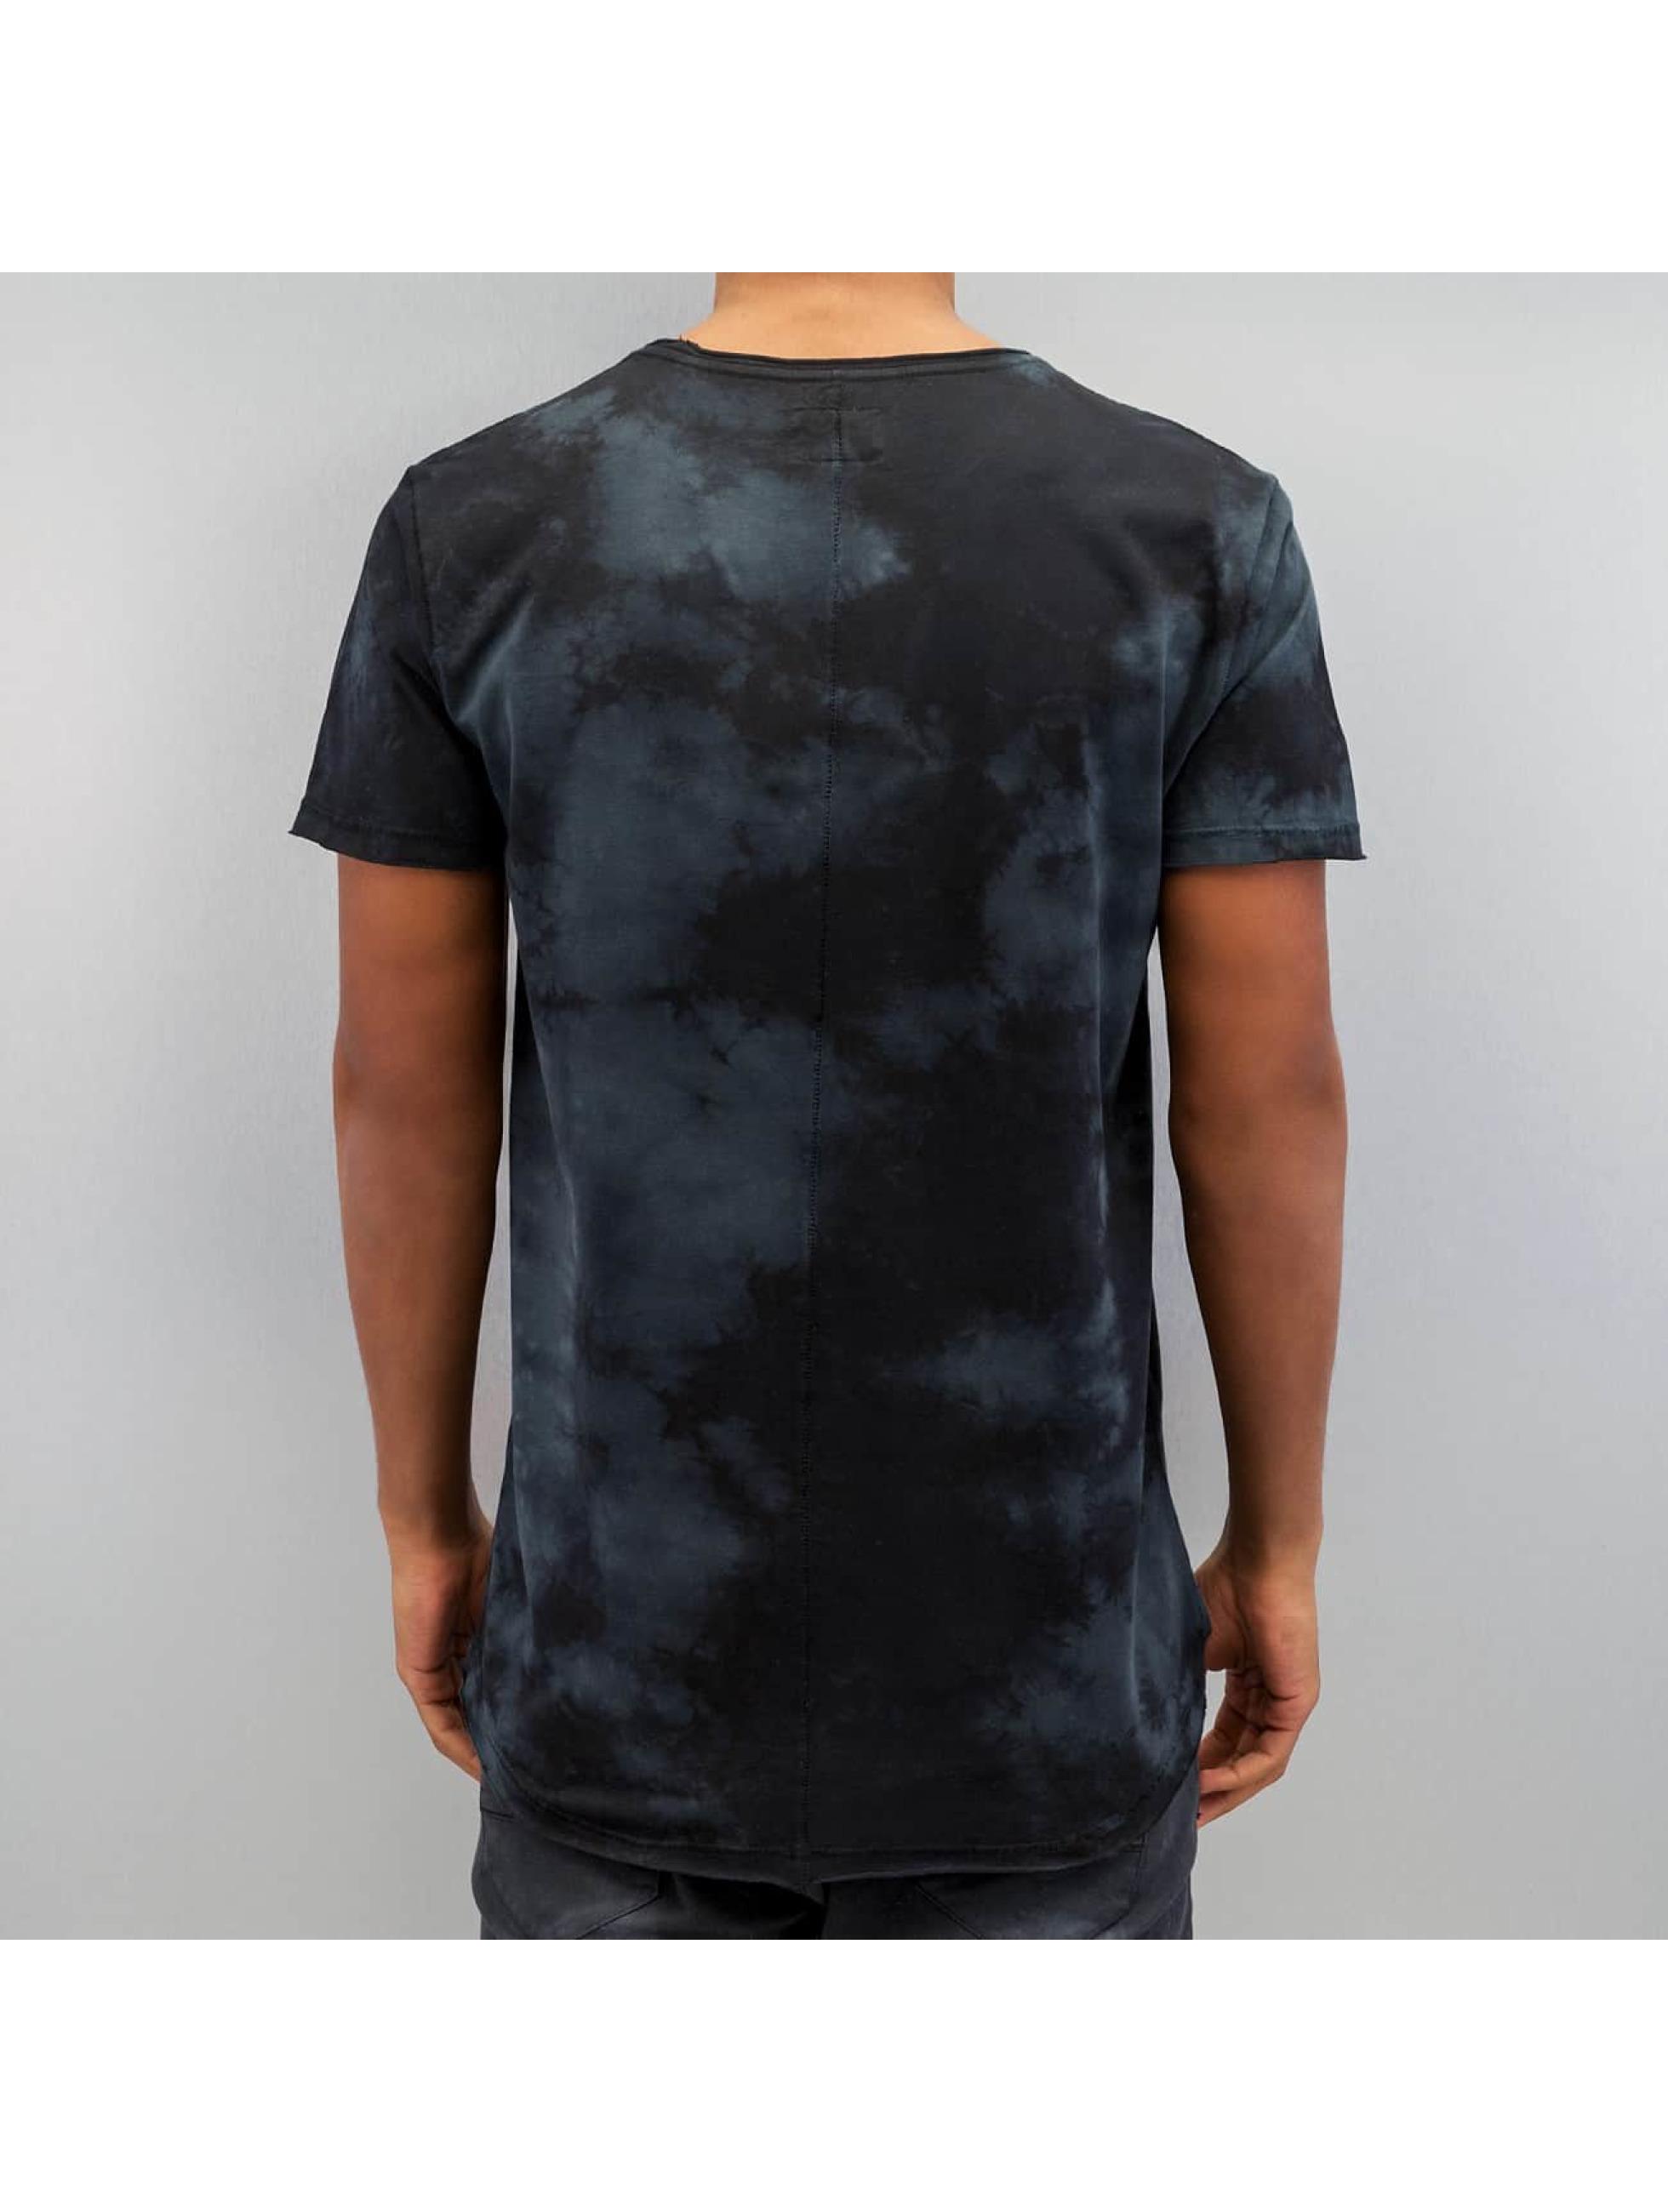 SHINE Original T-Shirt Acid Washed gris